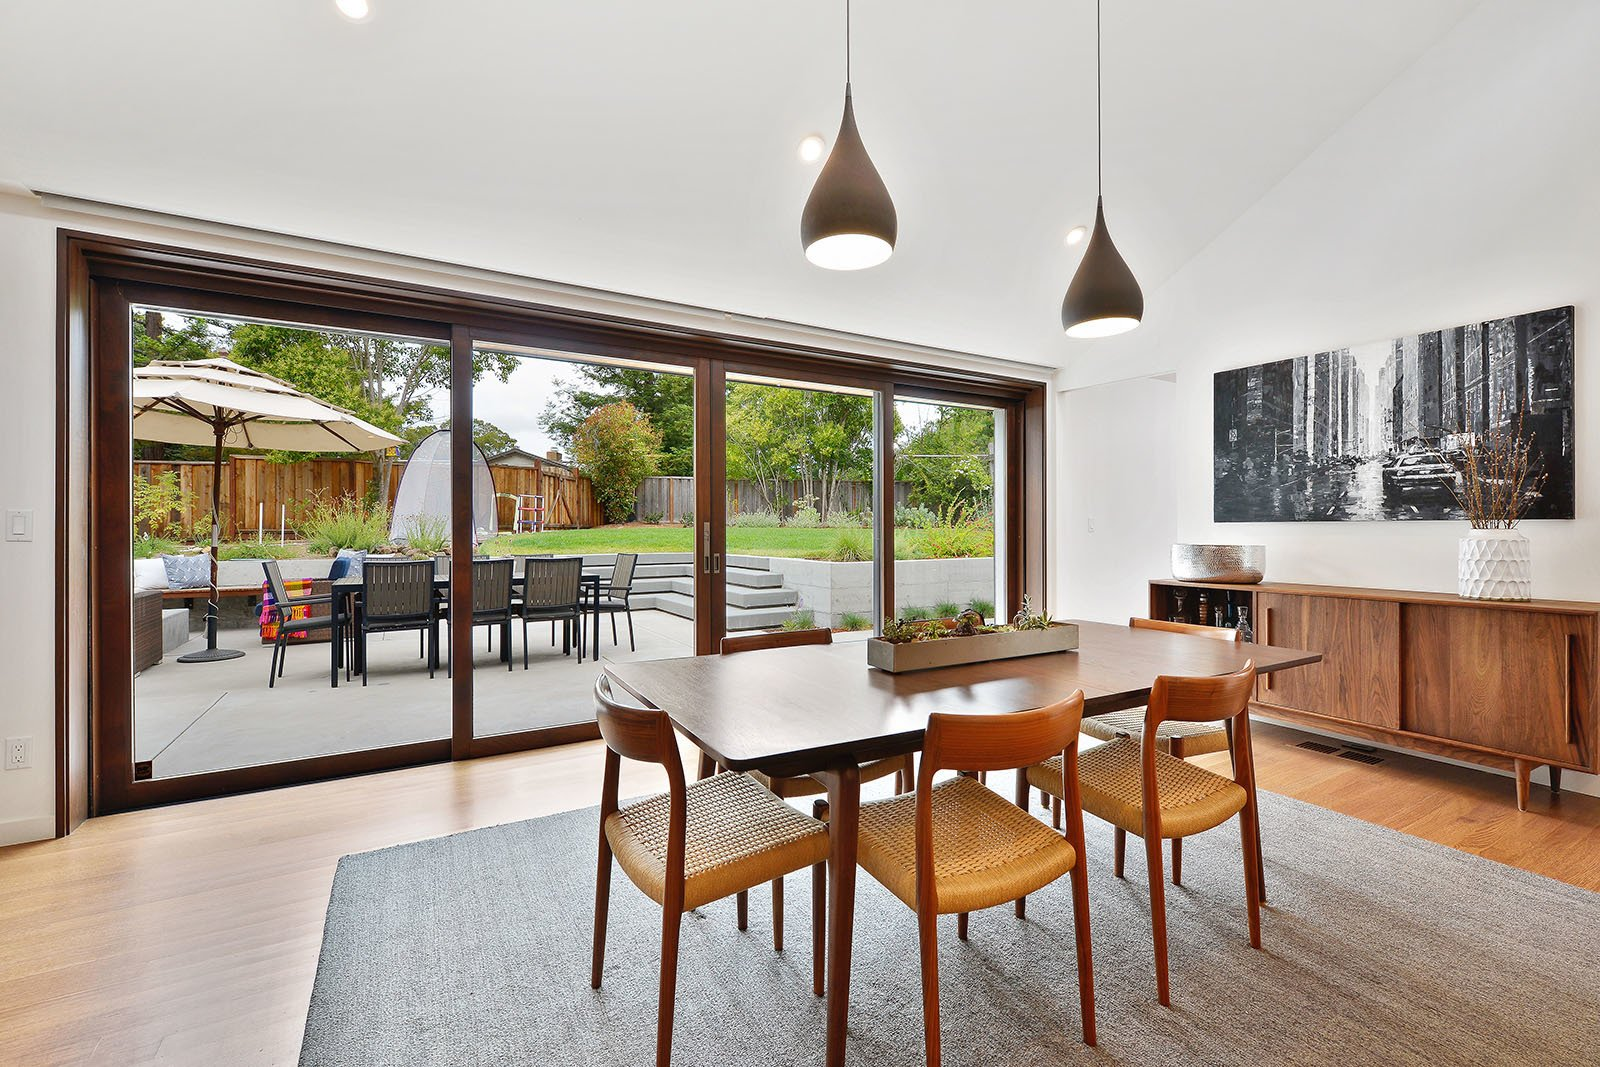 Dining Room, Table, Ceiling Lighting, Chair, Medium Hardwood Floor, and Pendant Lighting Dining room  Portola Valley by patrick perez/designpad architecture